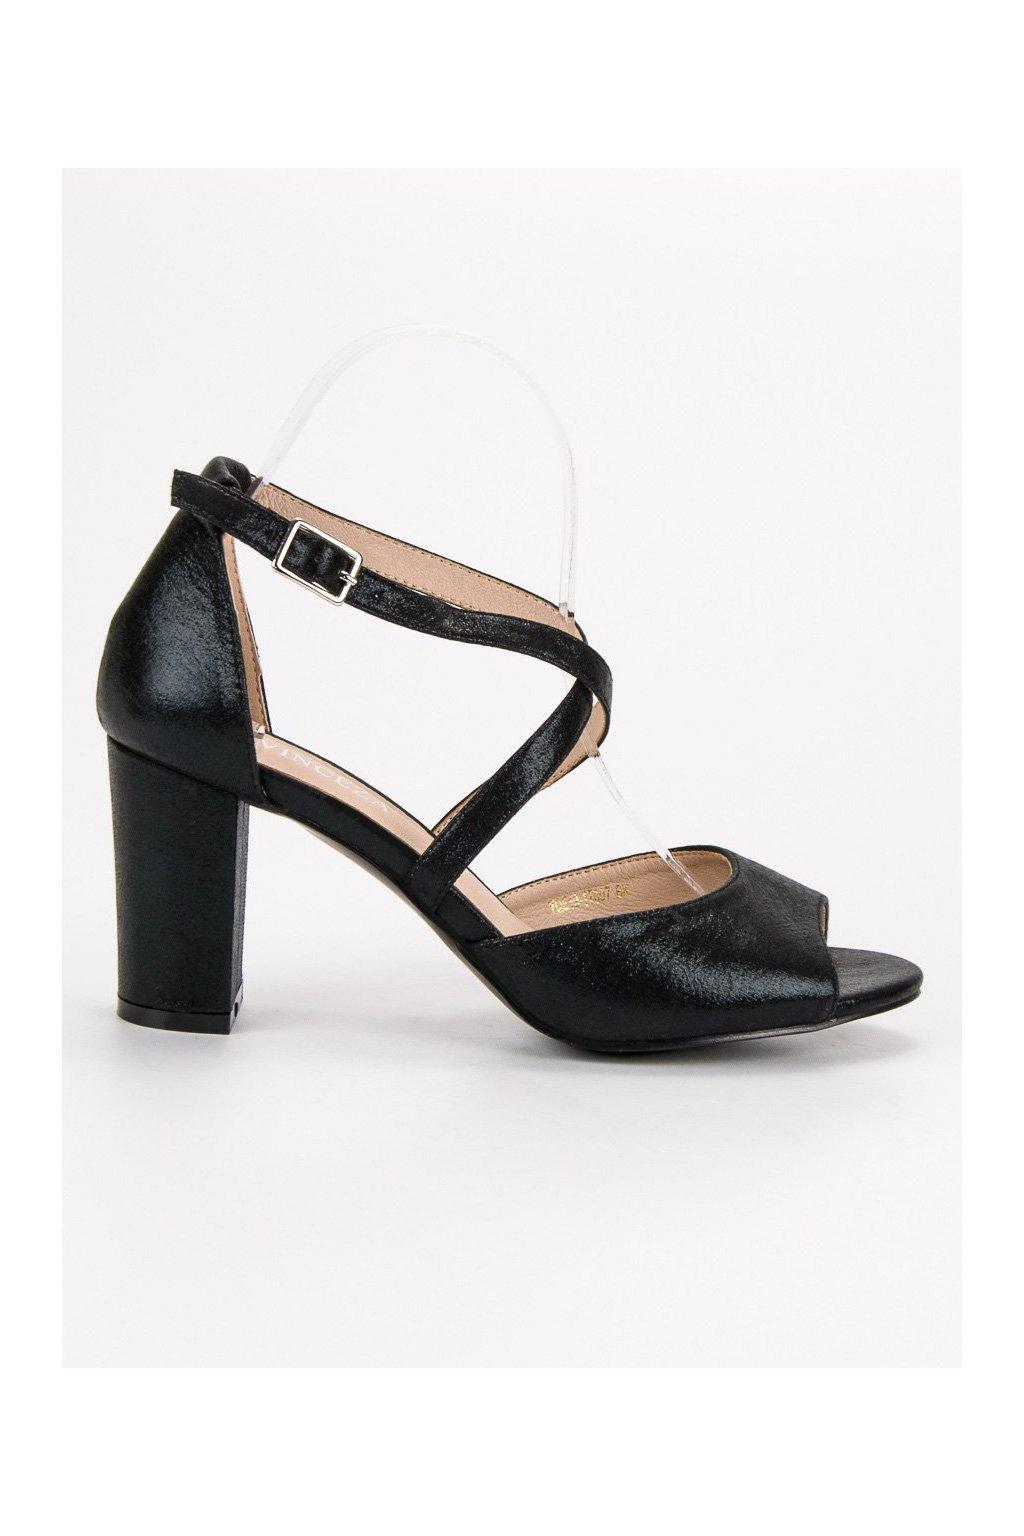 95e1ce0f08 Sandále